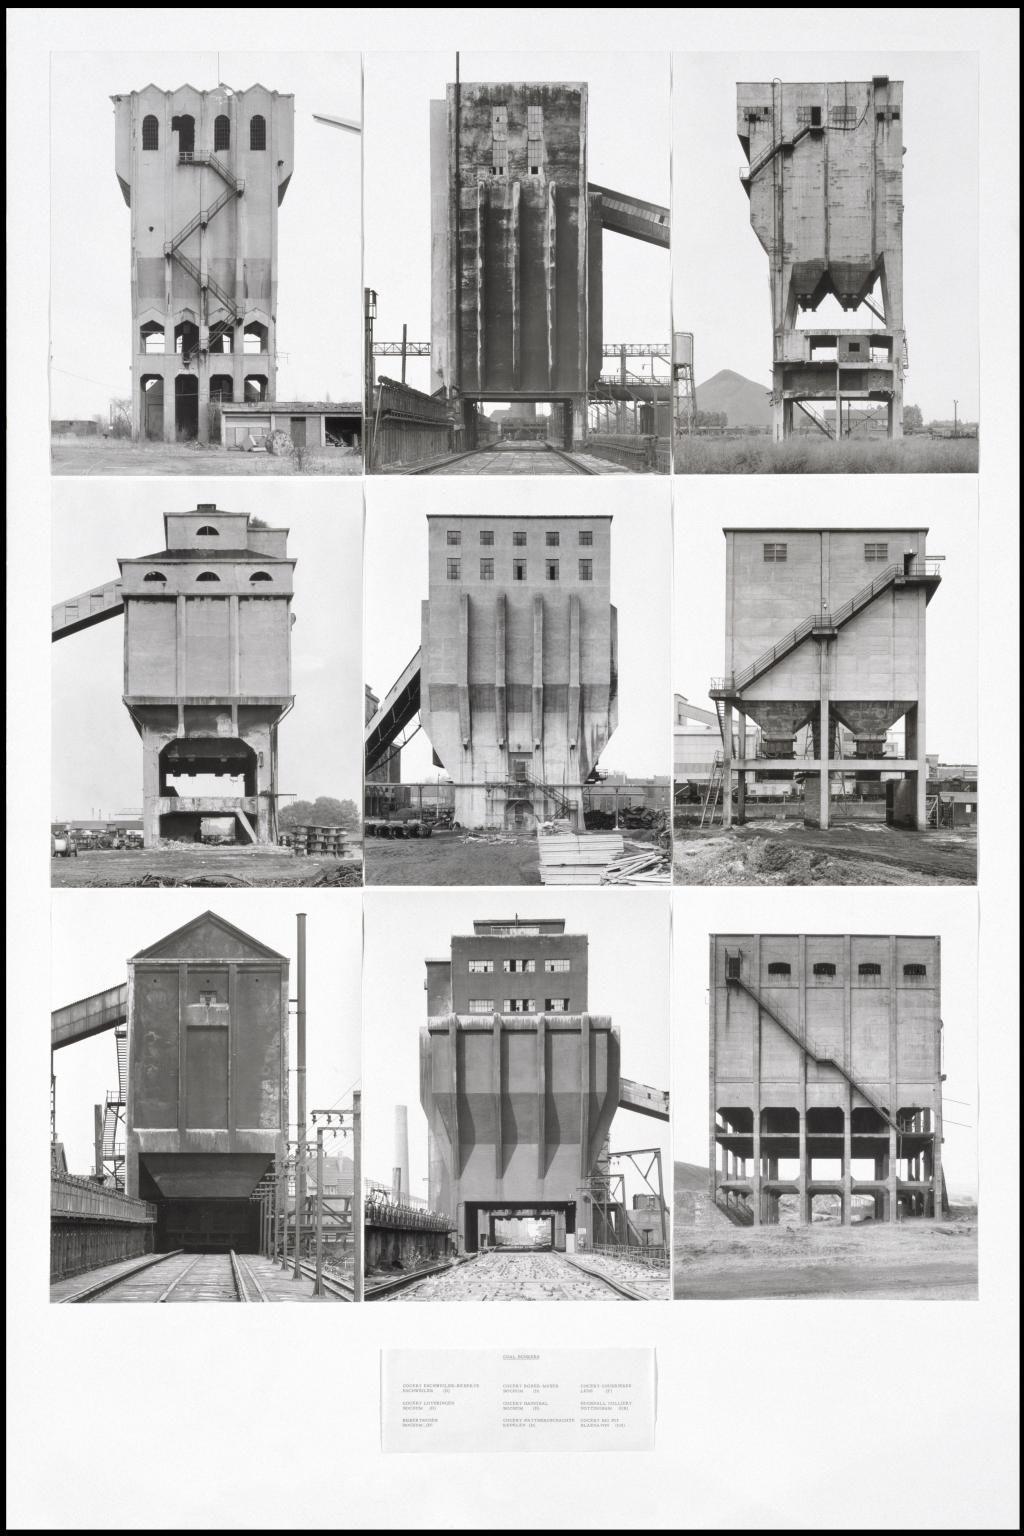 Coal Bunkers 1974 by Bernd Becher and Hilla Becher 1931-2007, 1934-2015